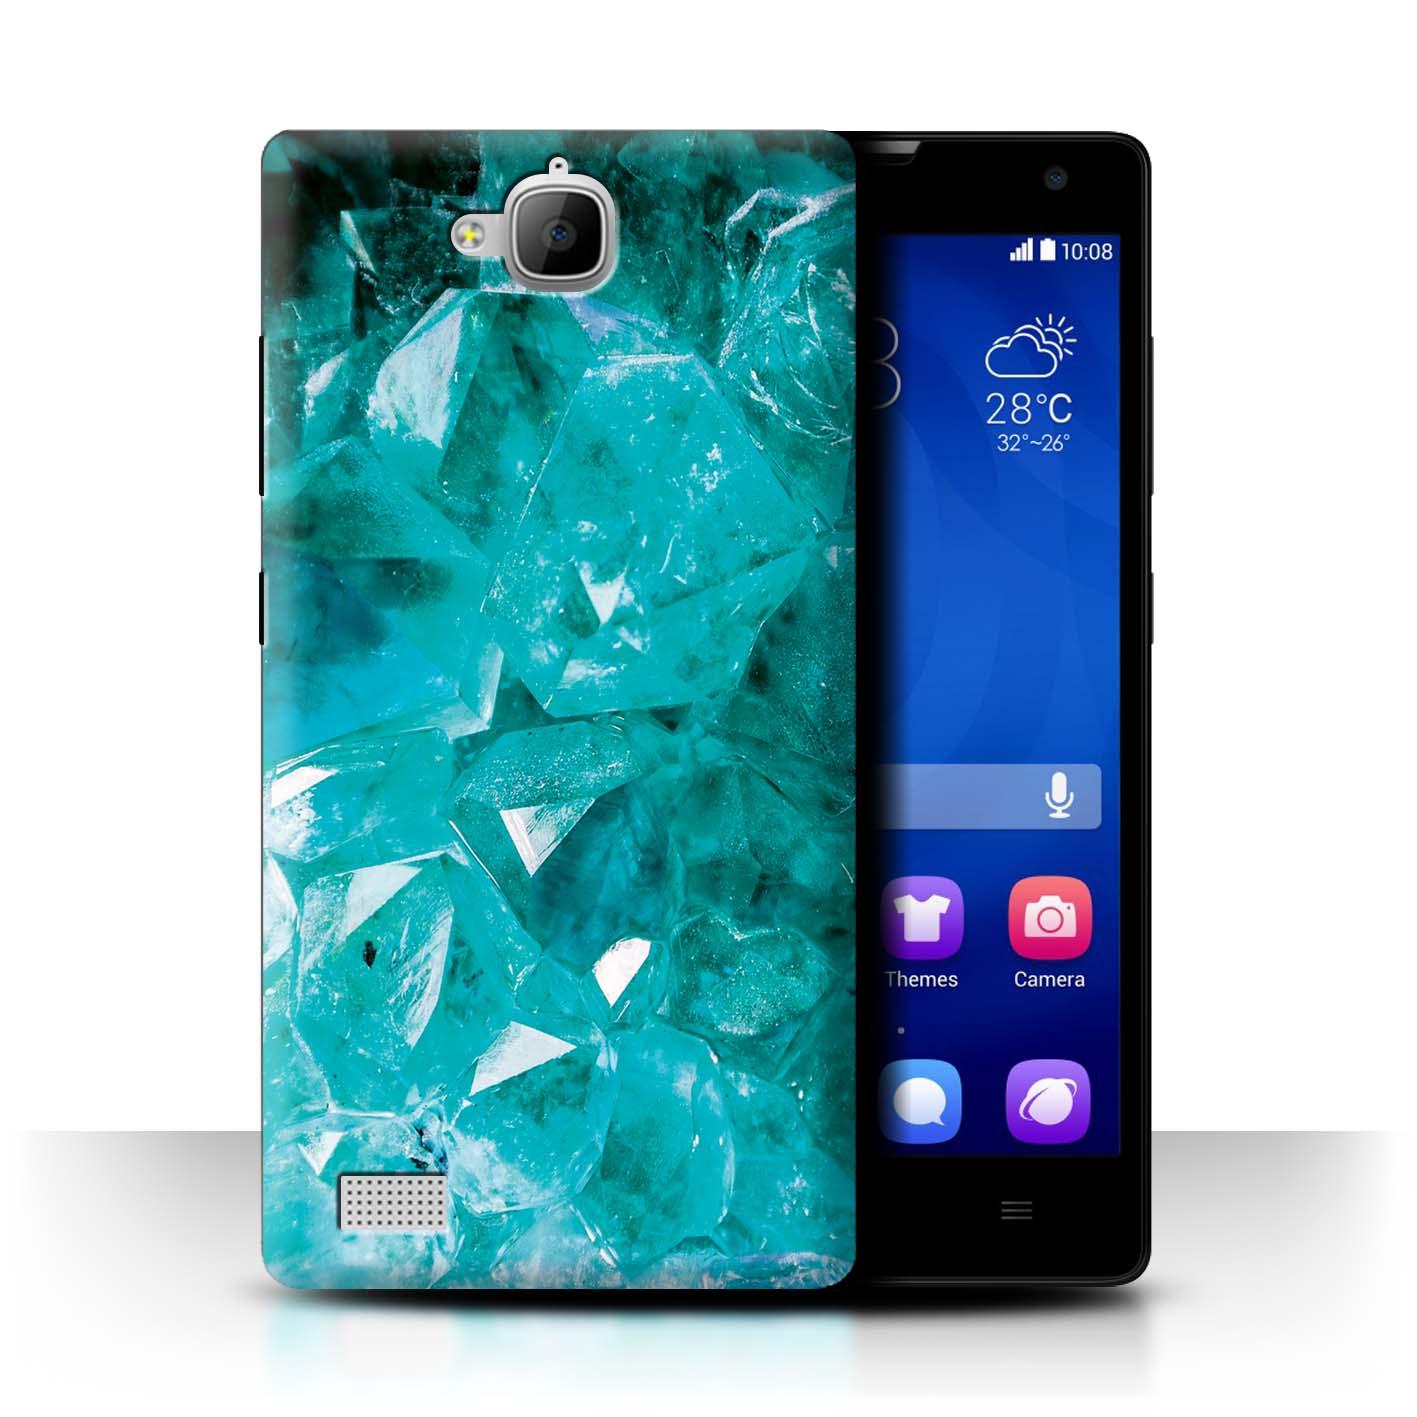 STUFF4-Funda-para-Telefono-para-Huawei-Honor-Smartphone-Birth-Gemstone